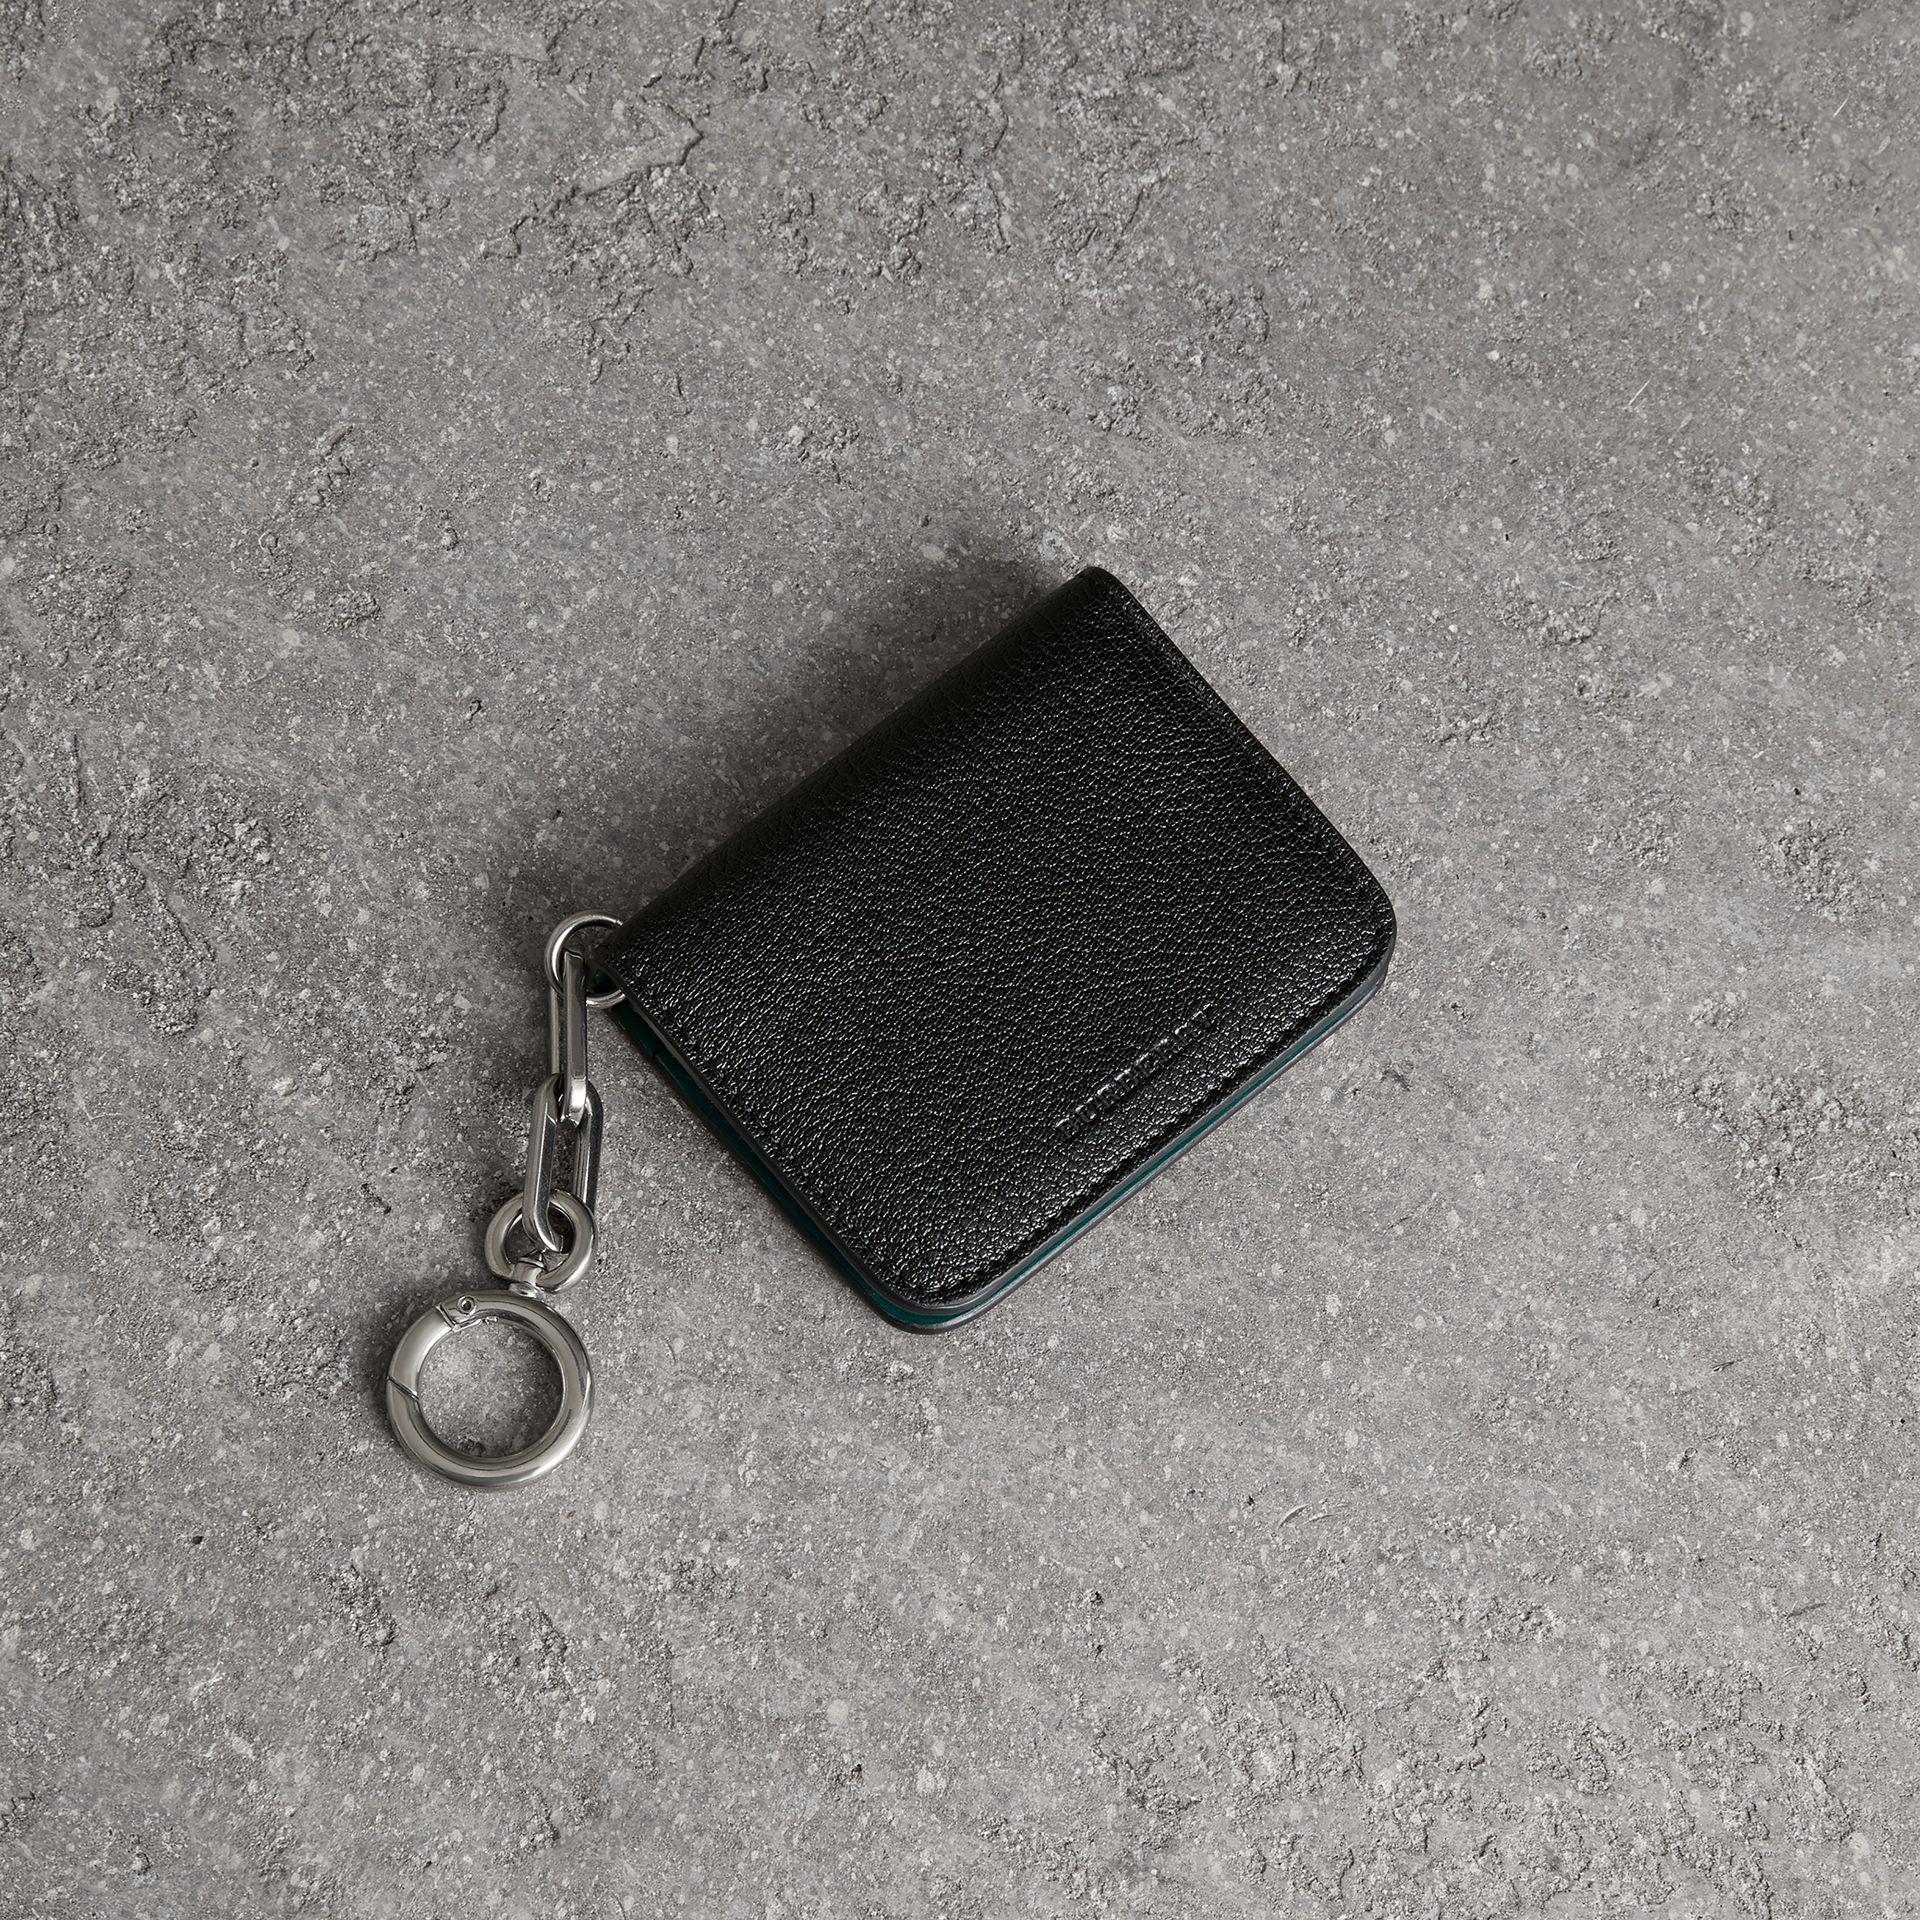 Link Detail Leather ID Card Case Charm - Black Burberry YFlG2UHl